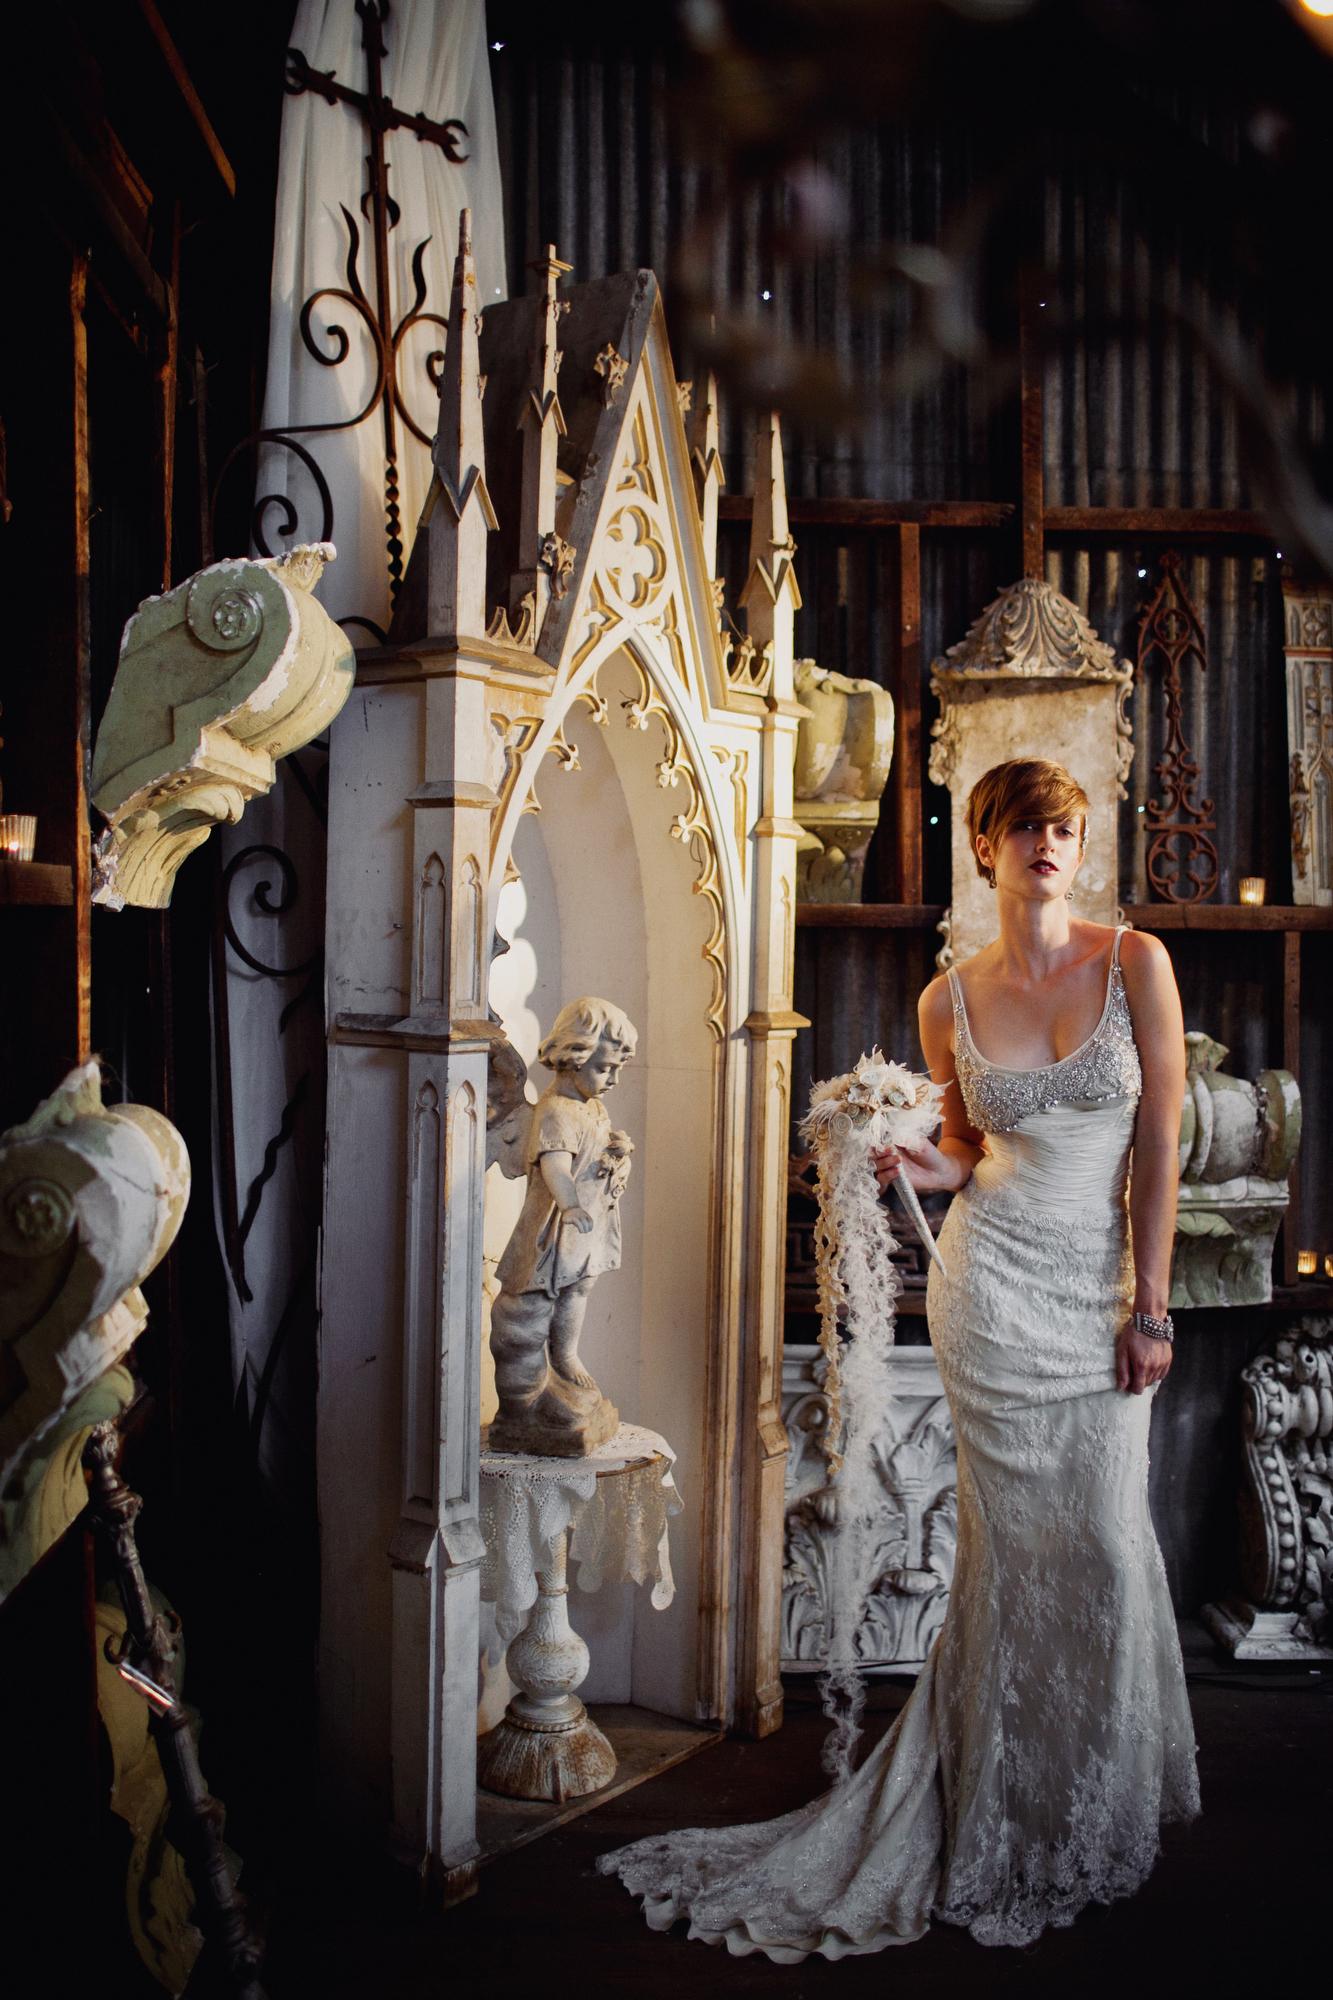 jennifer-skog-bridal-fashion-photographer-lifestyle-0004.jpg